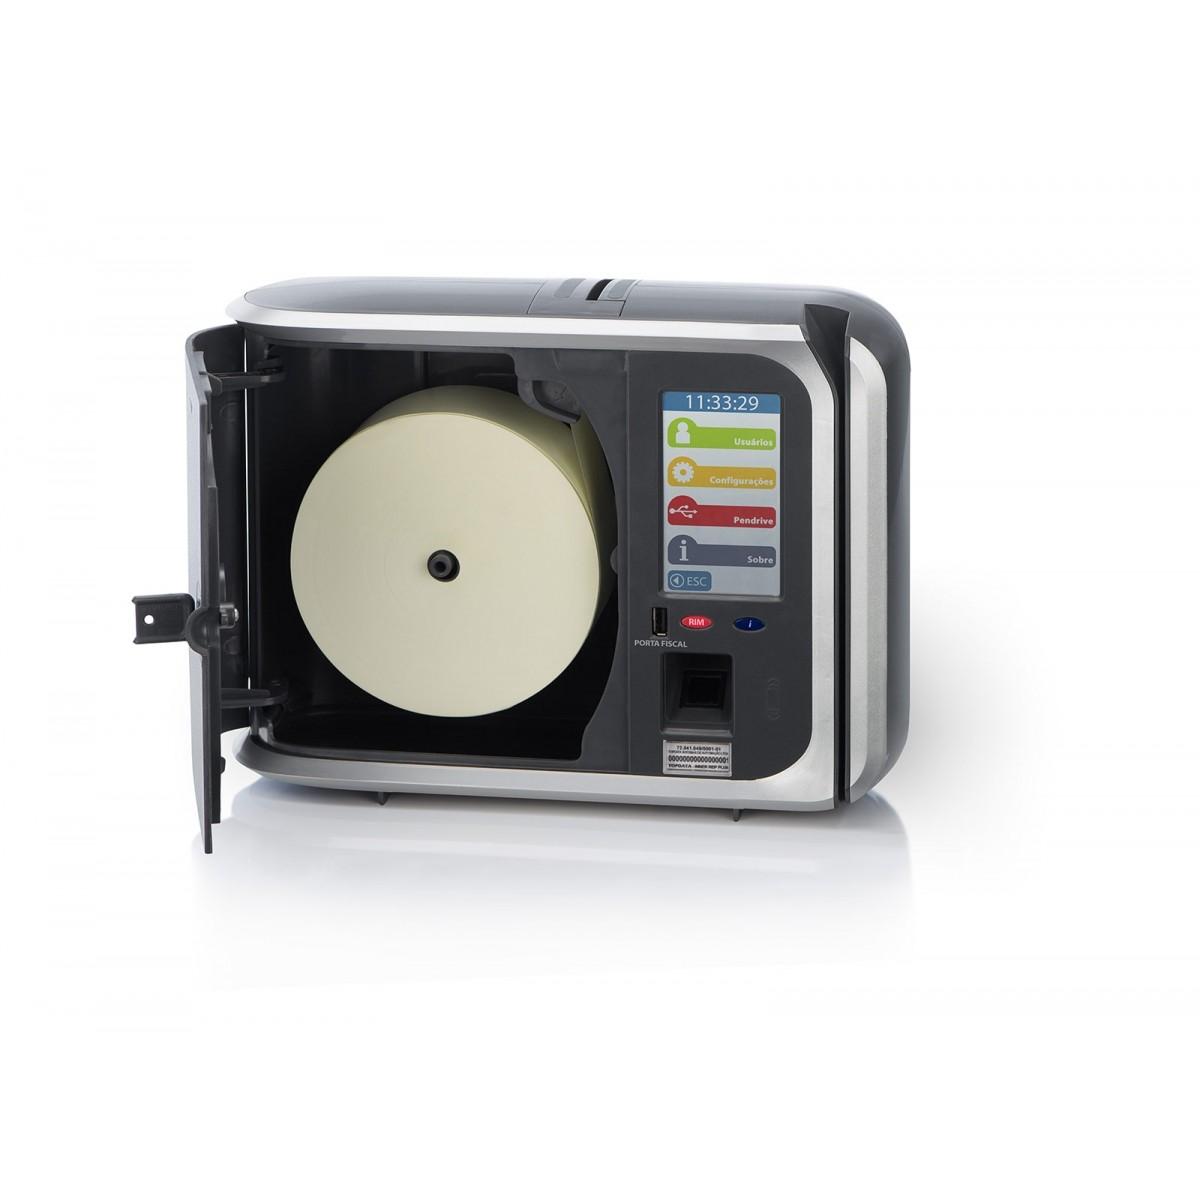 Relógio de Ponto Inner Rep Plus Bio Prox Barras LFD Topdata + Ponto Secullum 4  - Iponto Tecnologia